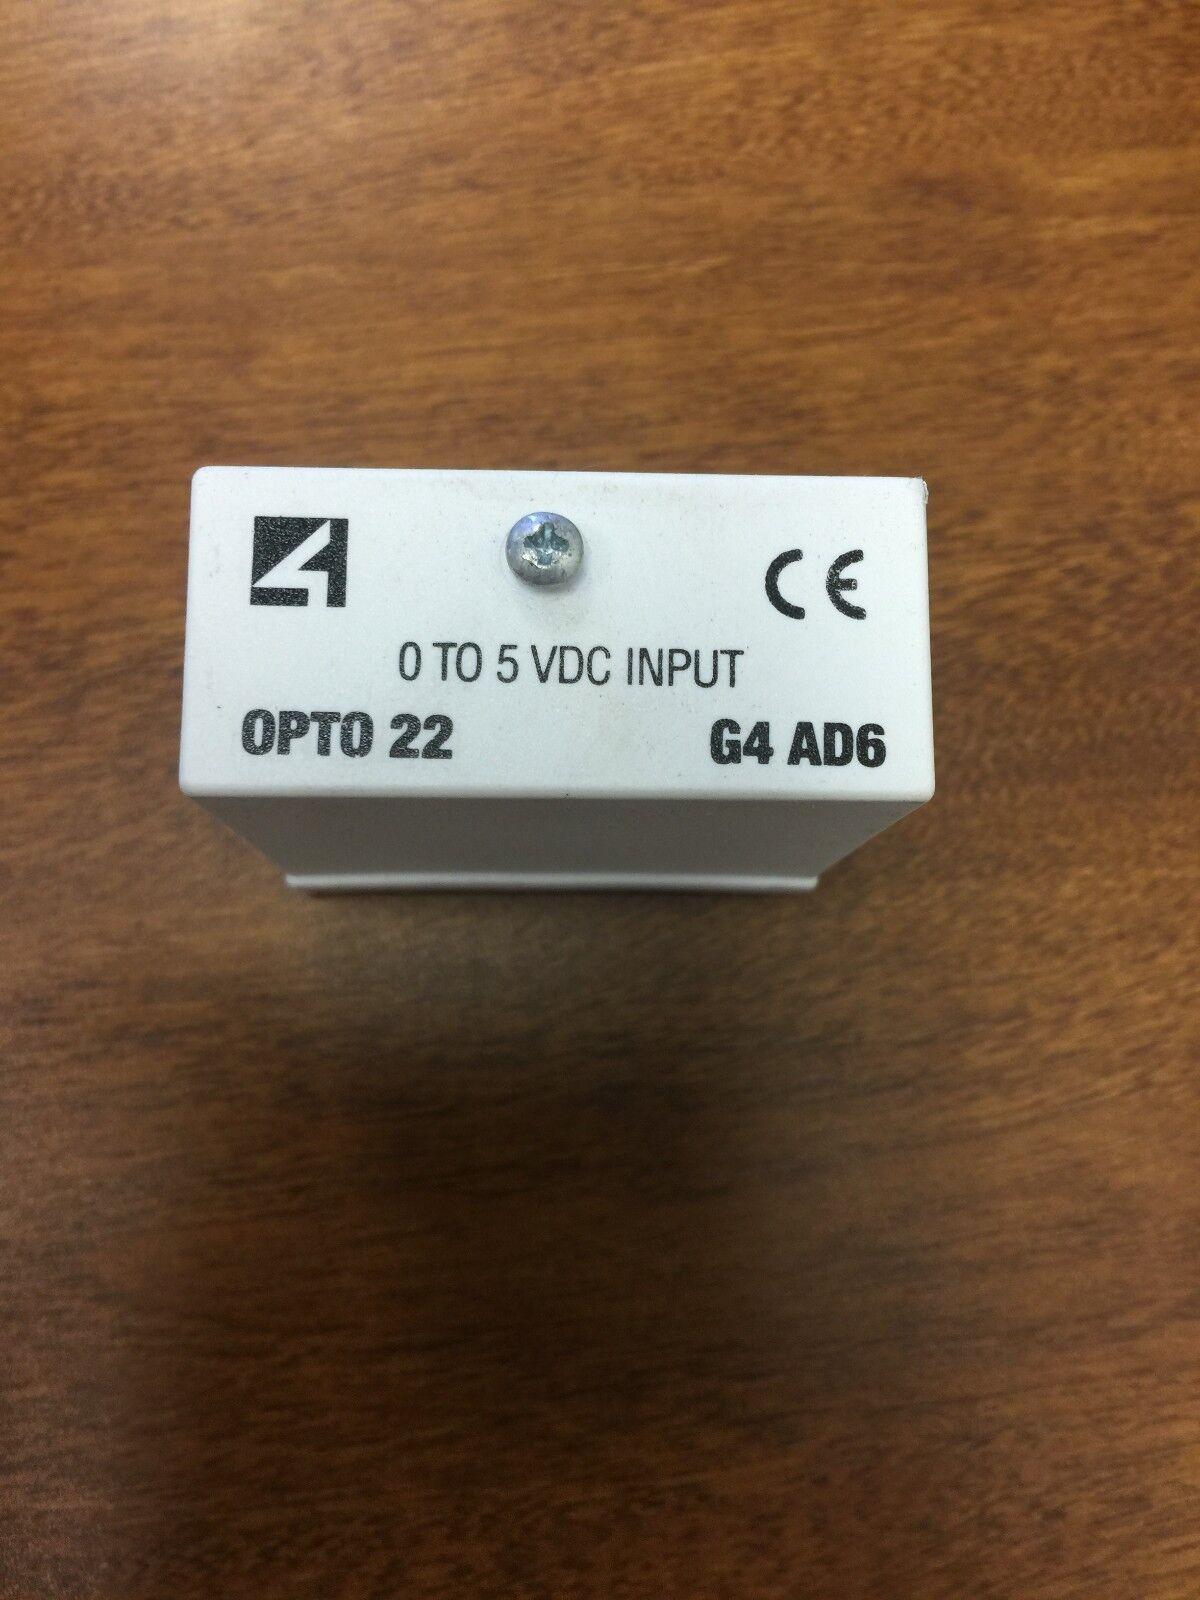 OPTO 22 G4AD6 G4 Analog I O Module  0-5 Volt AC DC Input - lot of 5